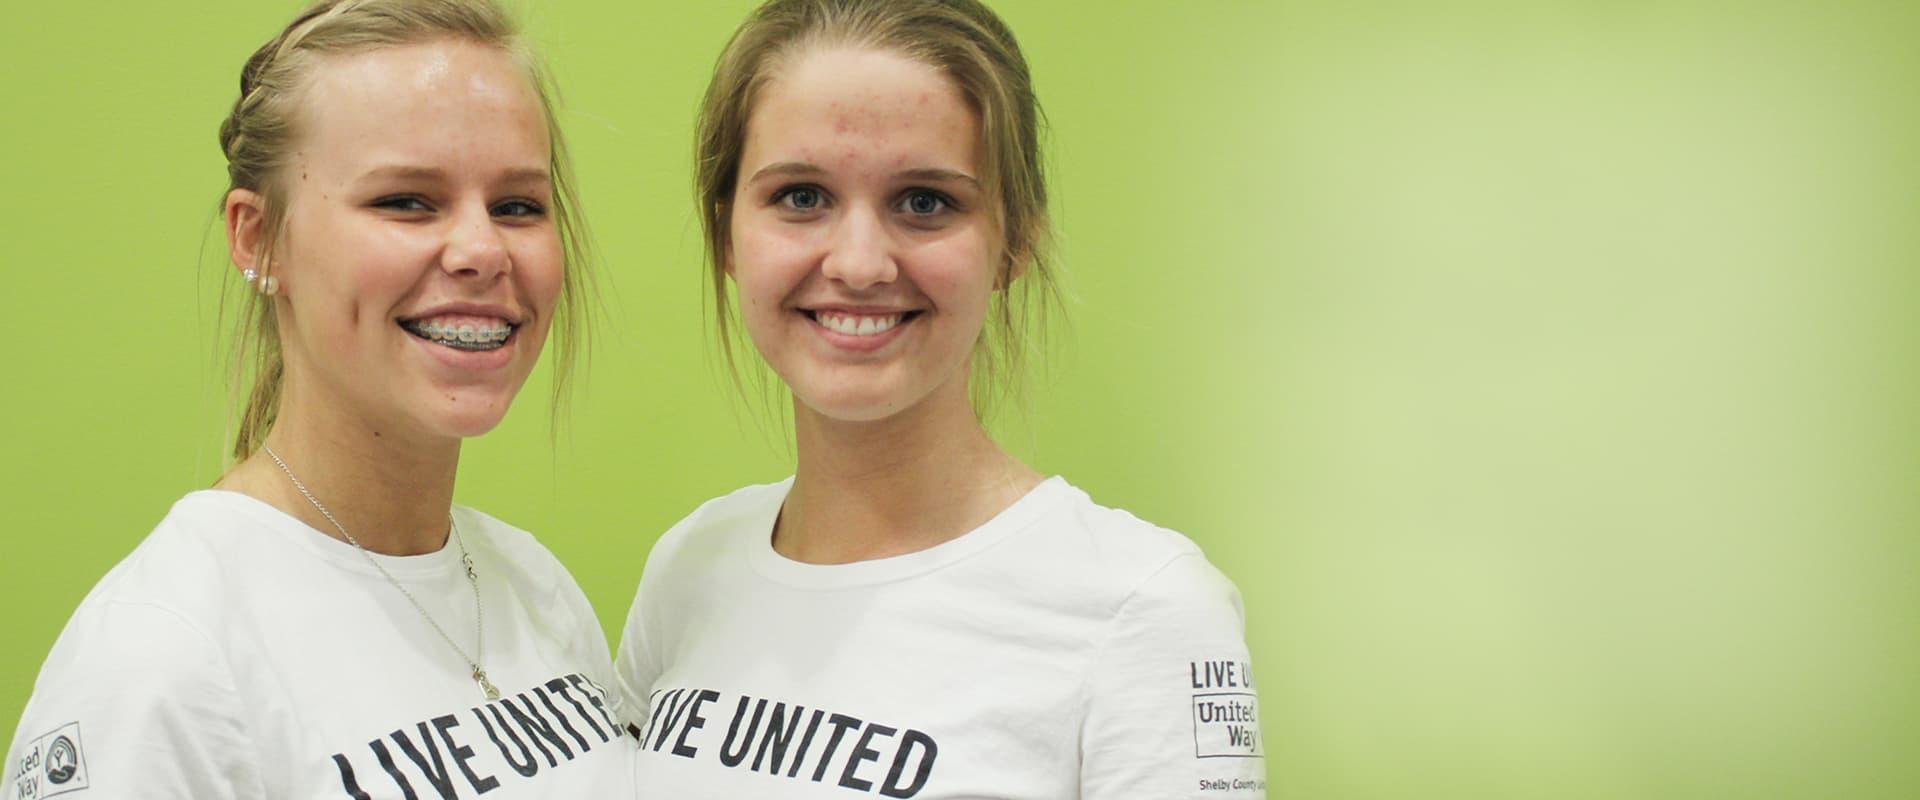 Student United Way Live United